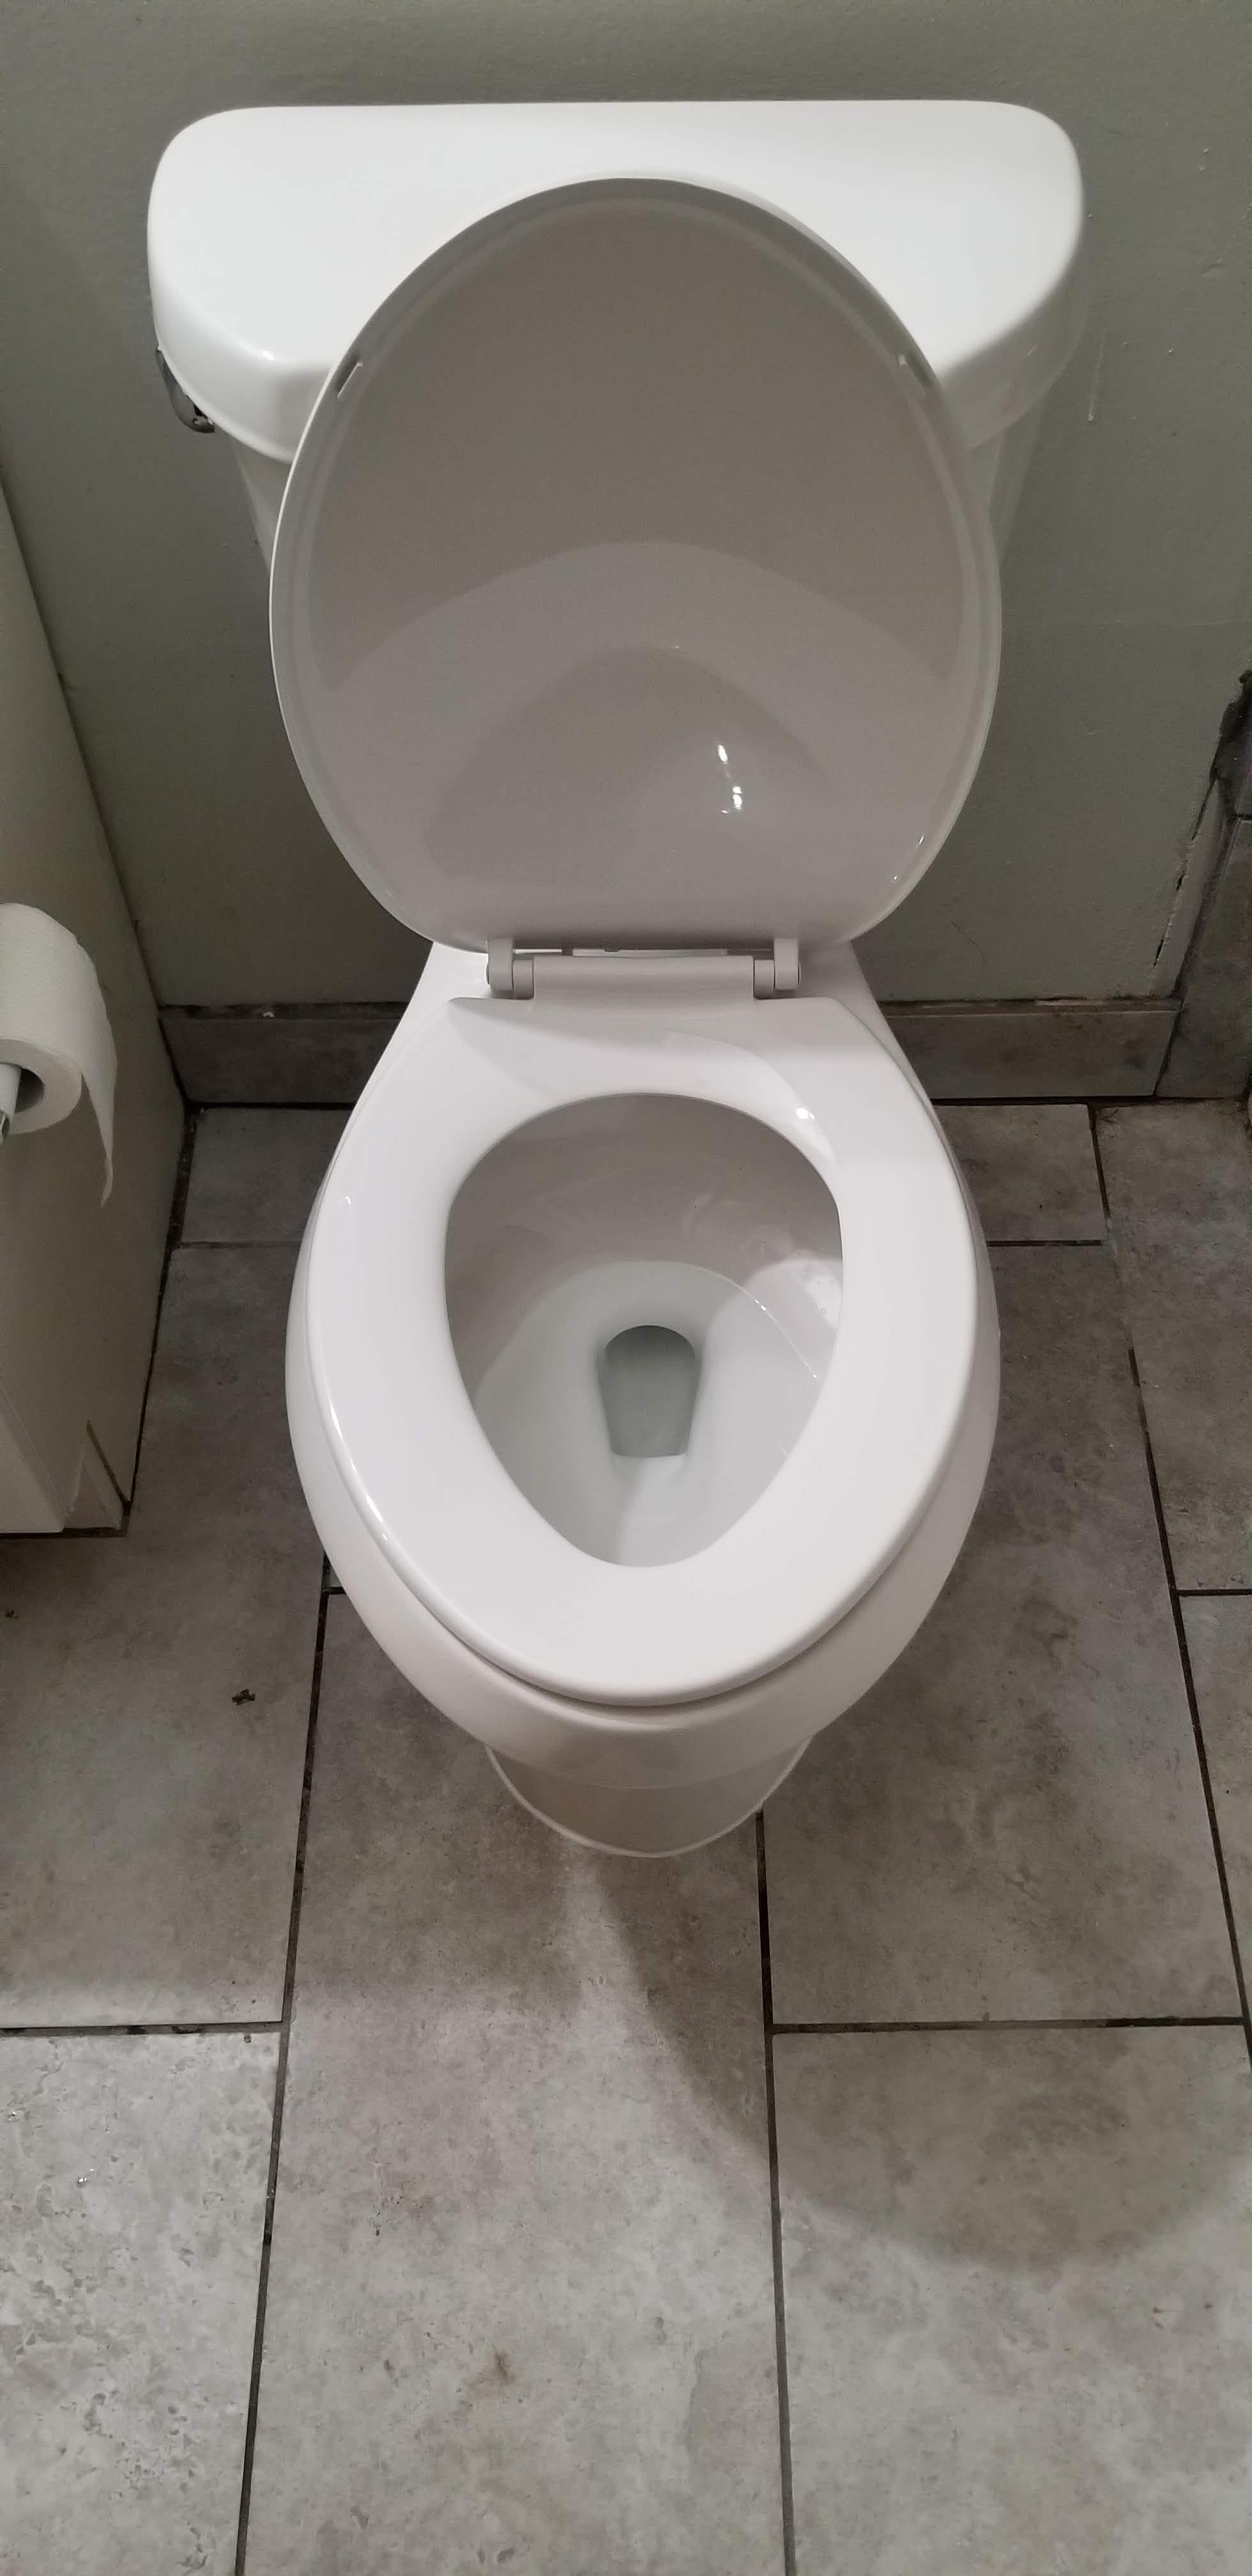 Fix the Drip! Plumbing Company image 2